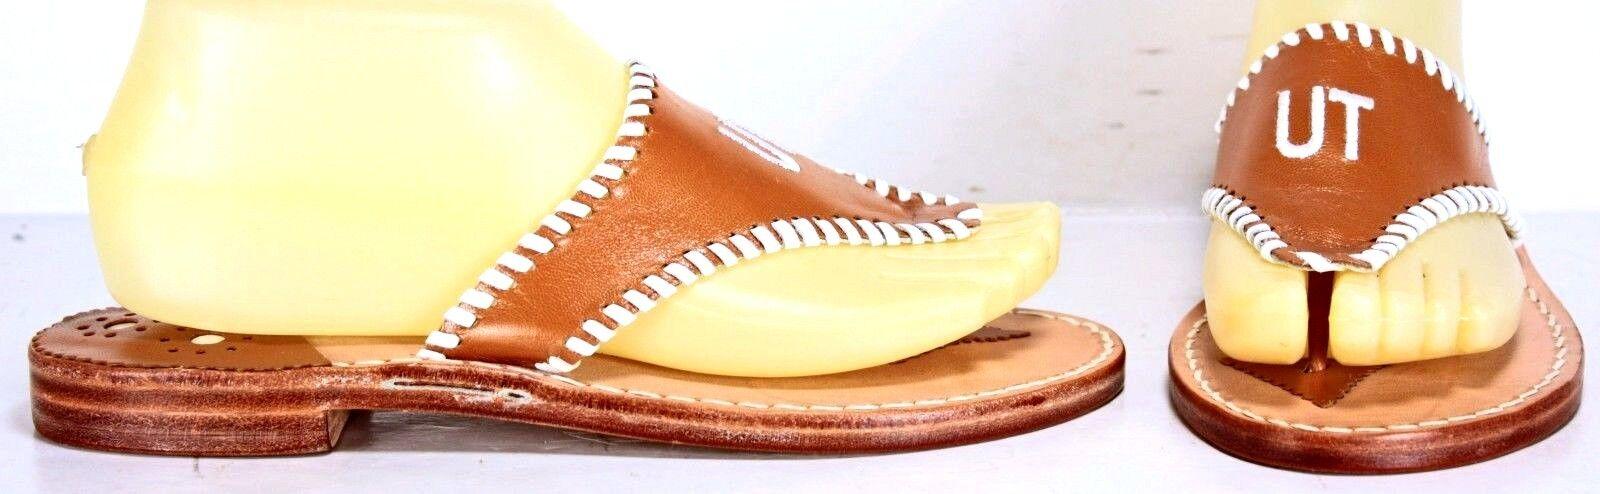 Stephen Bonanno Womens Flip Flops sz 7 M Sandals University of Texas ML2